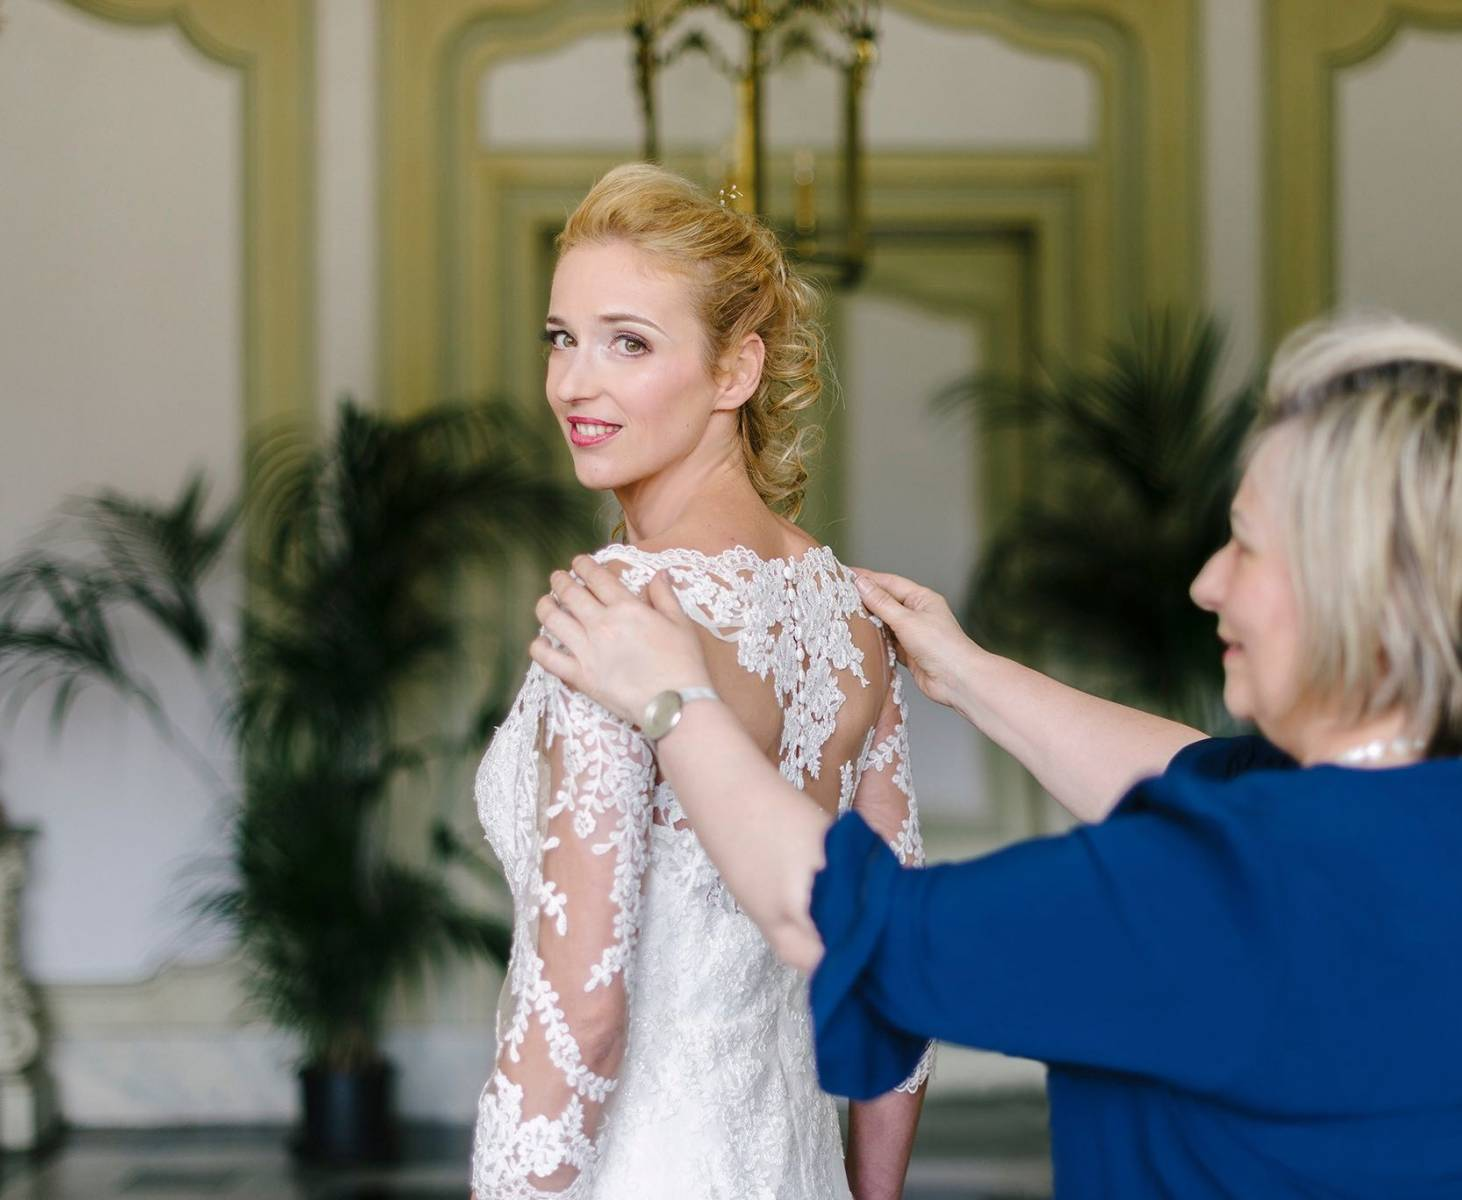 Corestilo - Beauty - Make-up - House of Weddings - 2